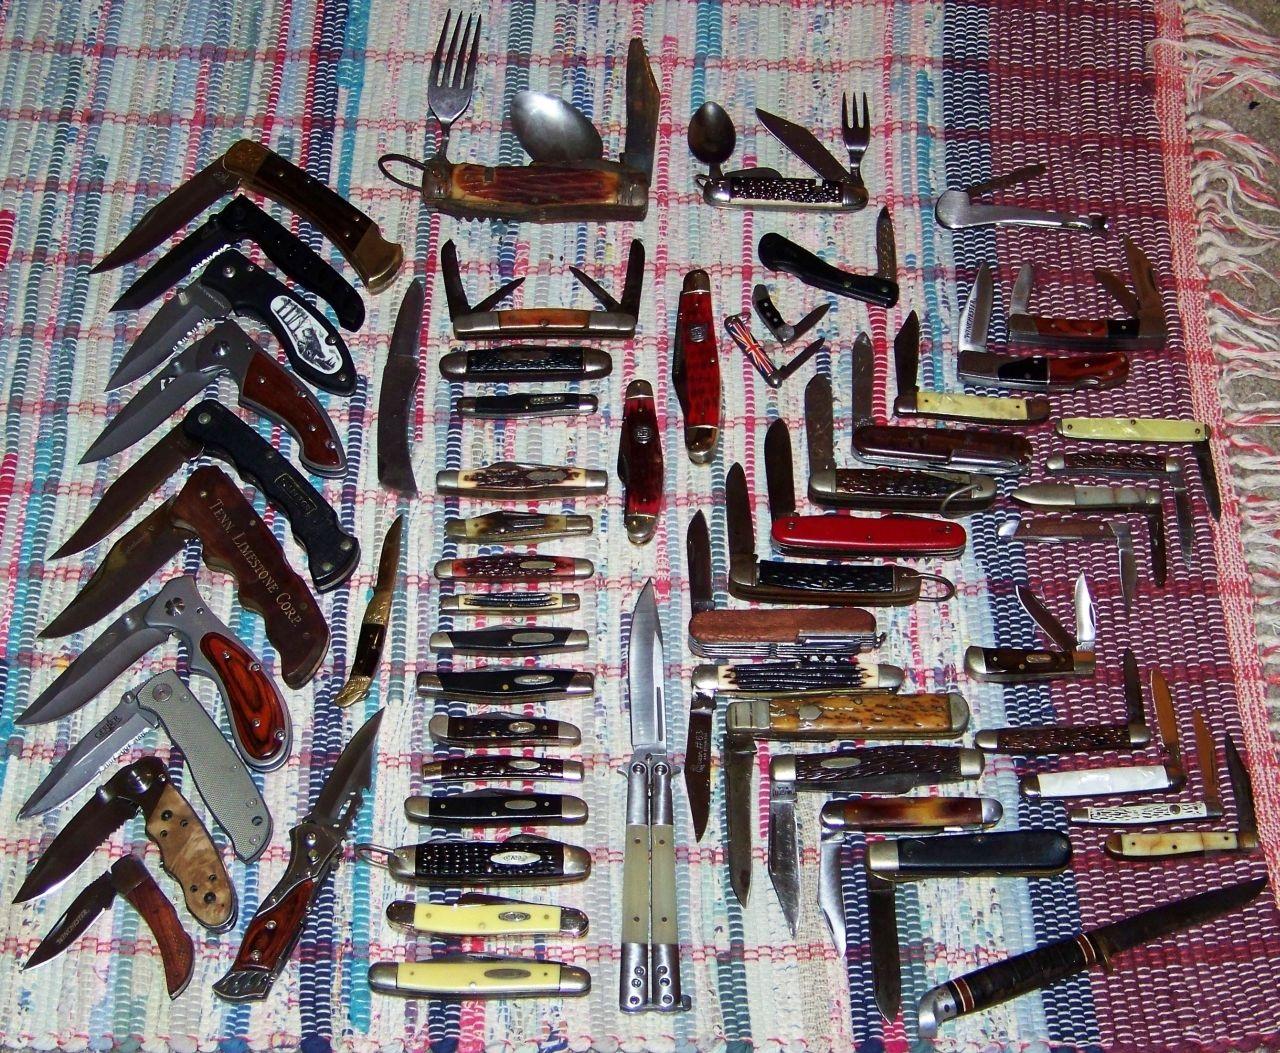 Kitchen Knife Sales Online